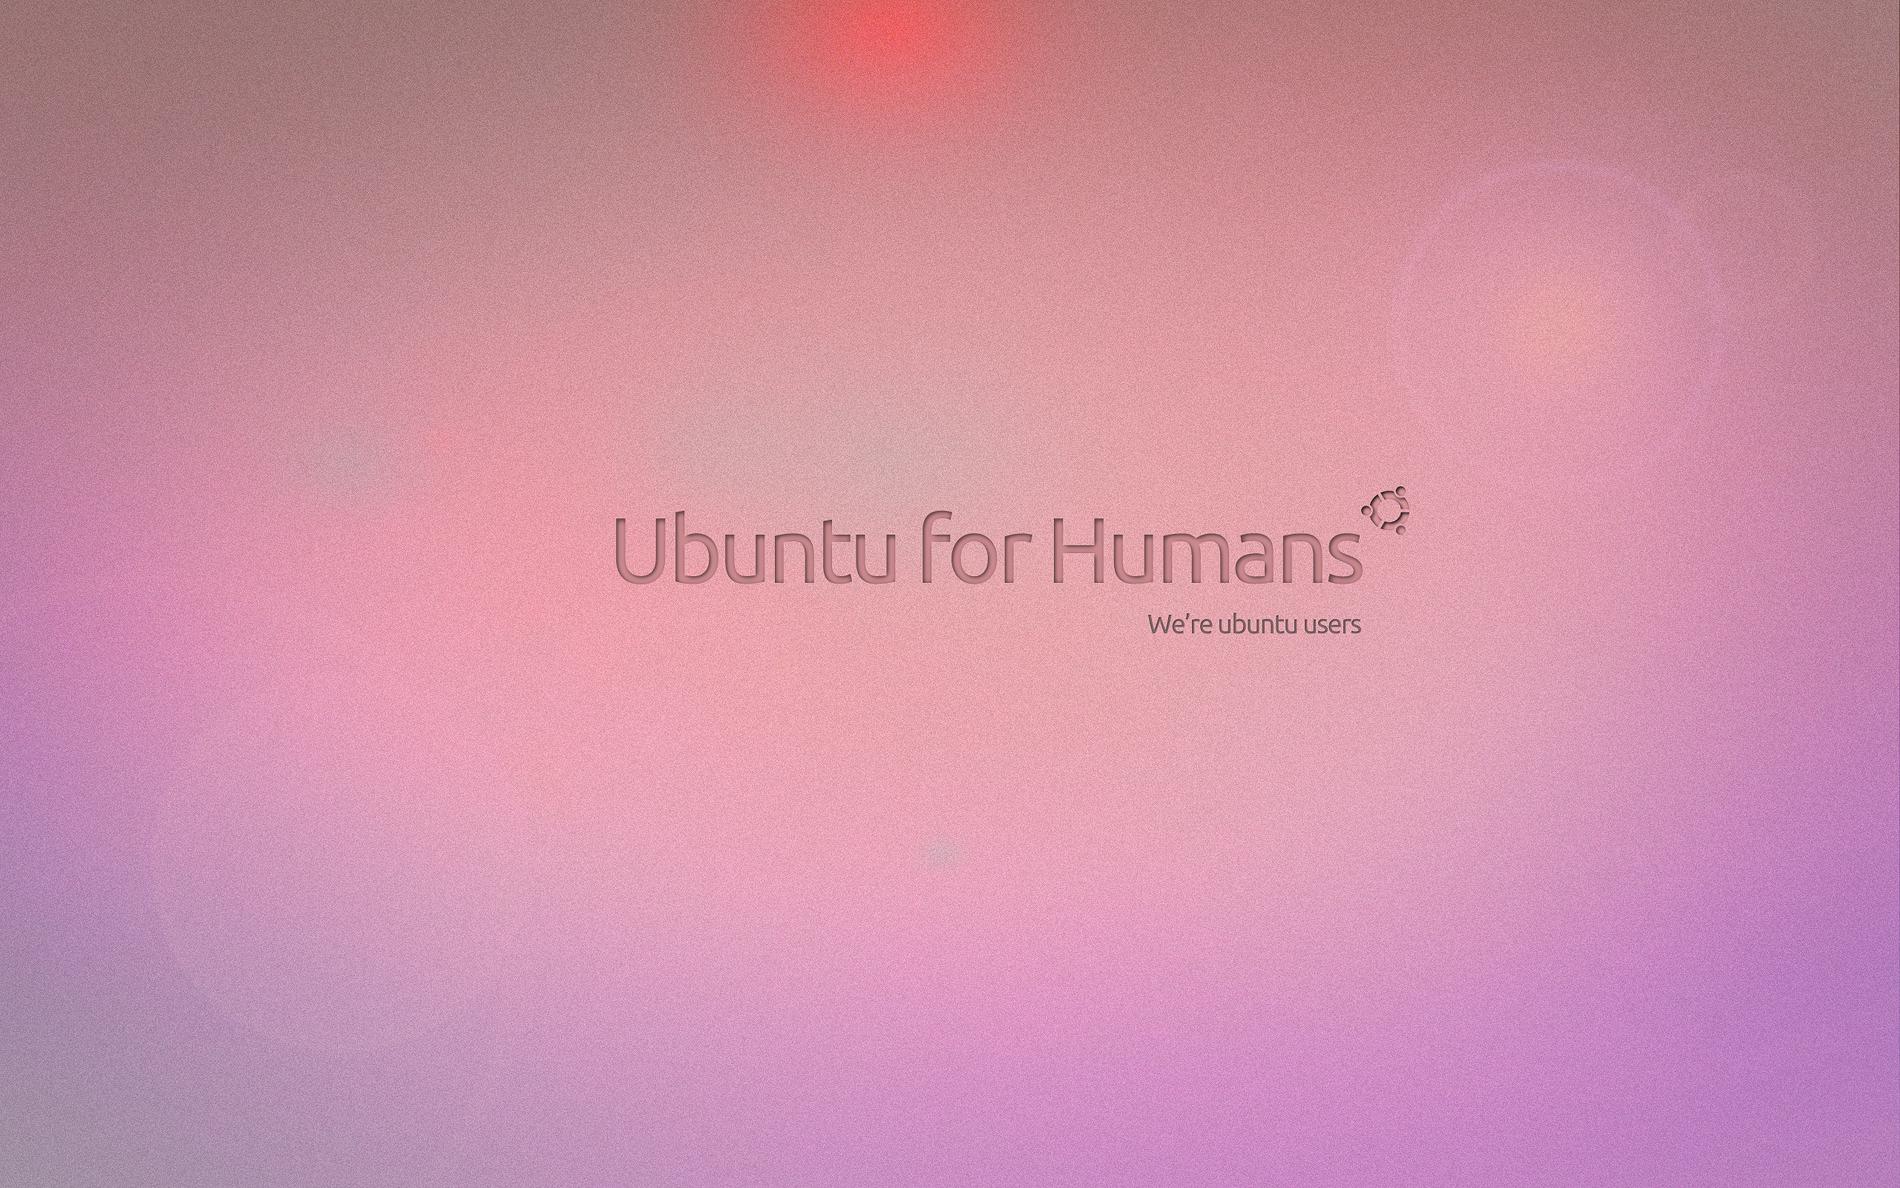 Ubuntu_for_Humans_sexy default by Felipi